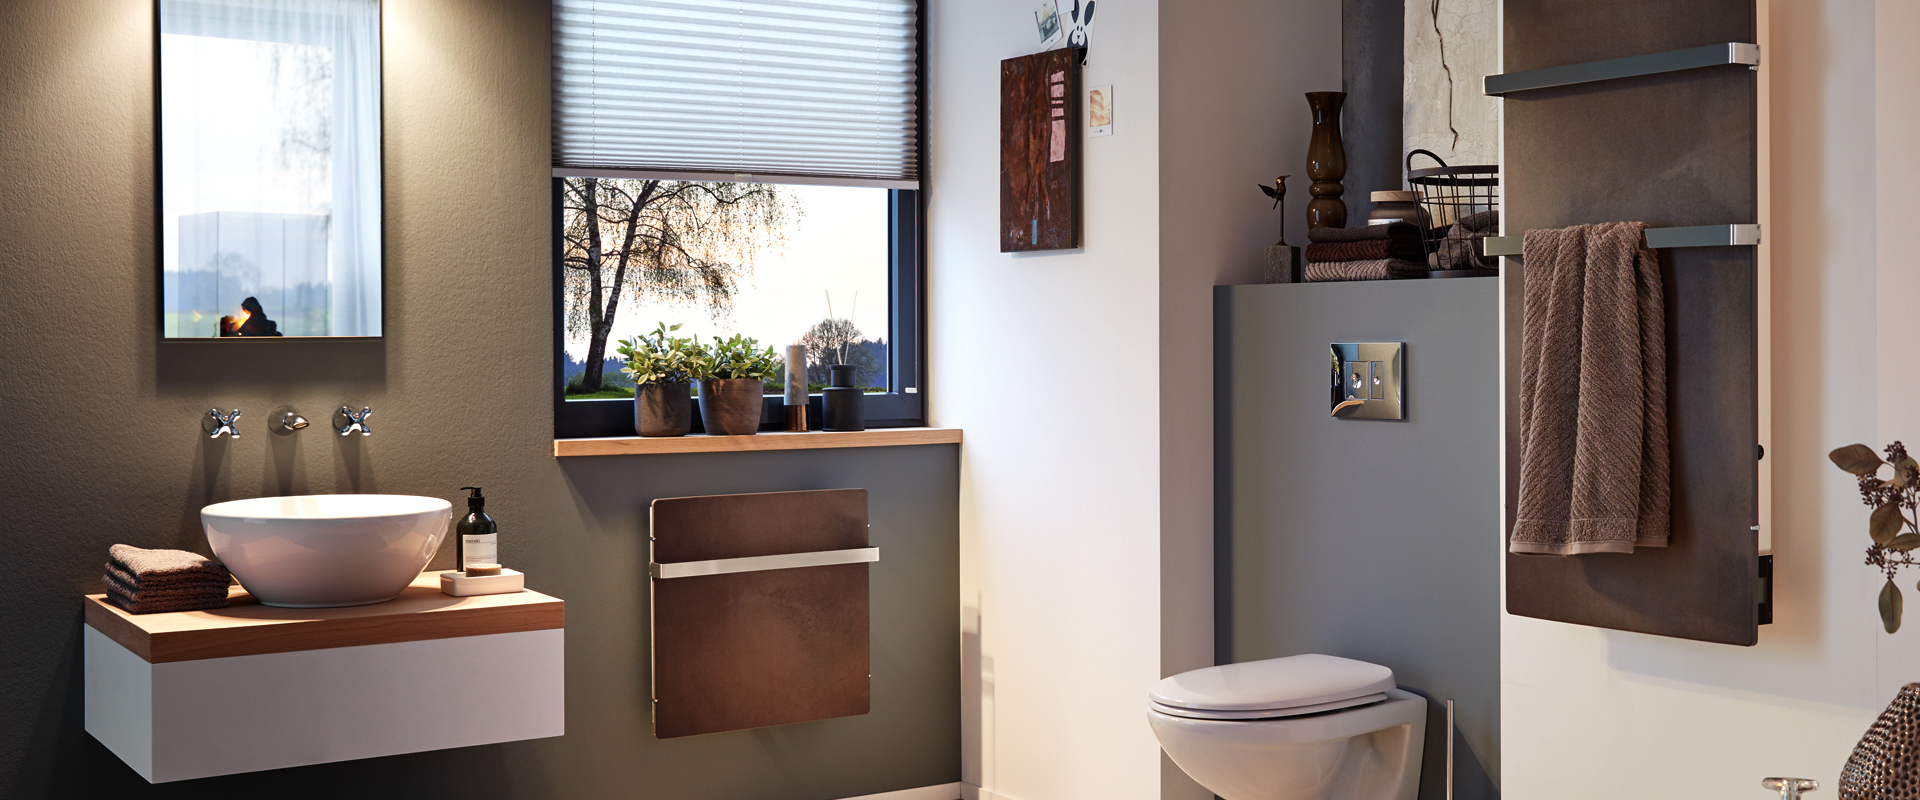 badheizung elektrisch. Black Bedroom Furniture Sets. Home Design Ideas